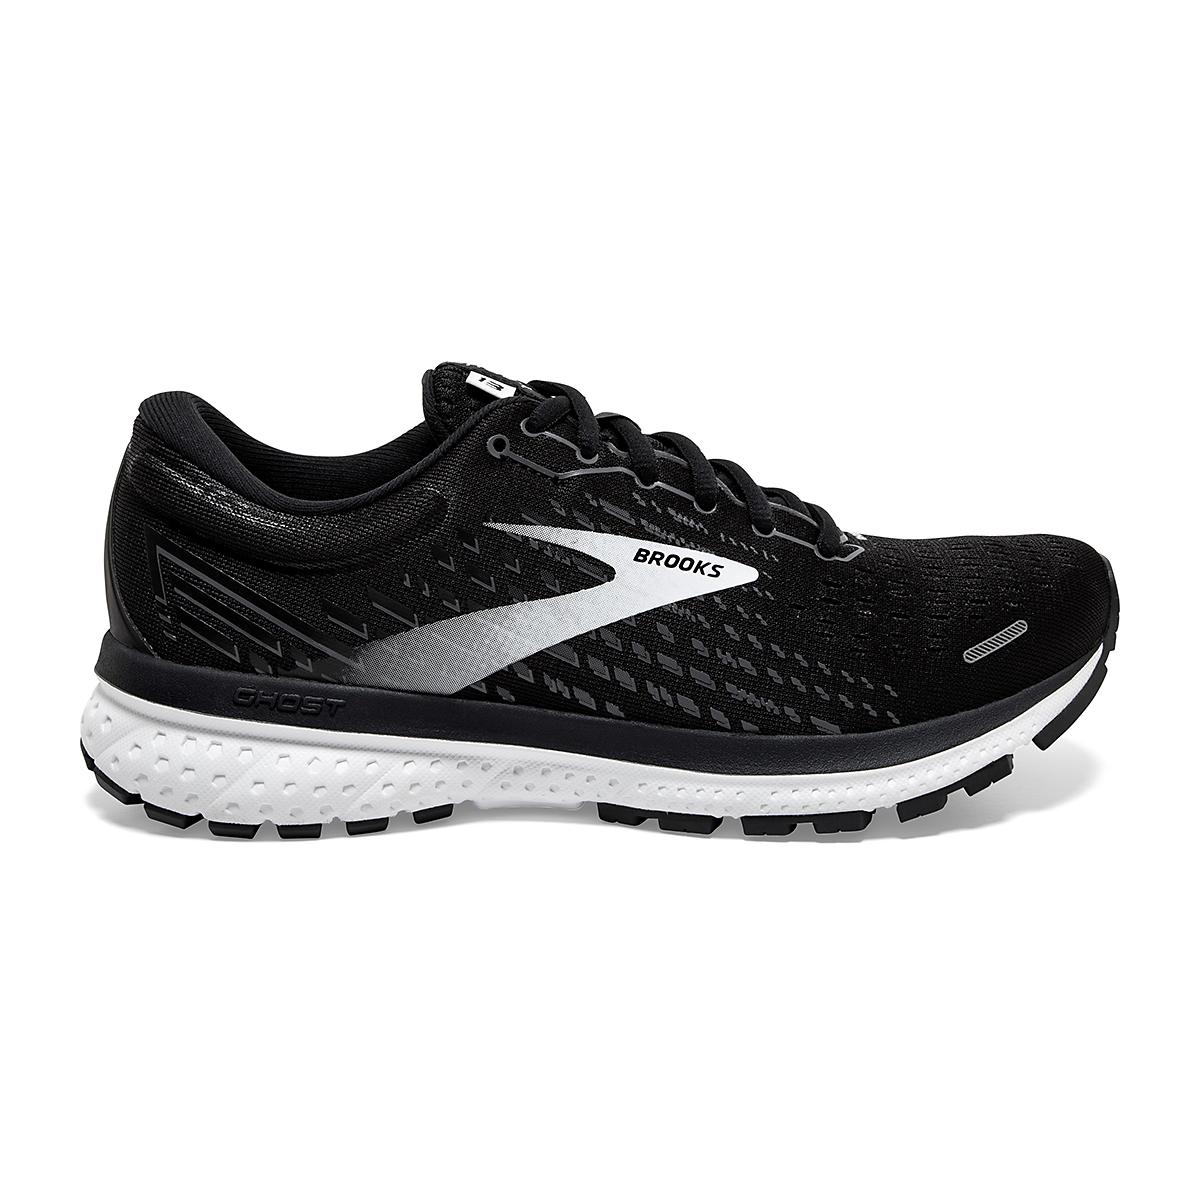 Women's Brooks Ghost 13 Running Shoe - Color: Black/Blackened - Size: 5 - Width: Regular, Black/Blackened, large, image 1